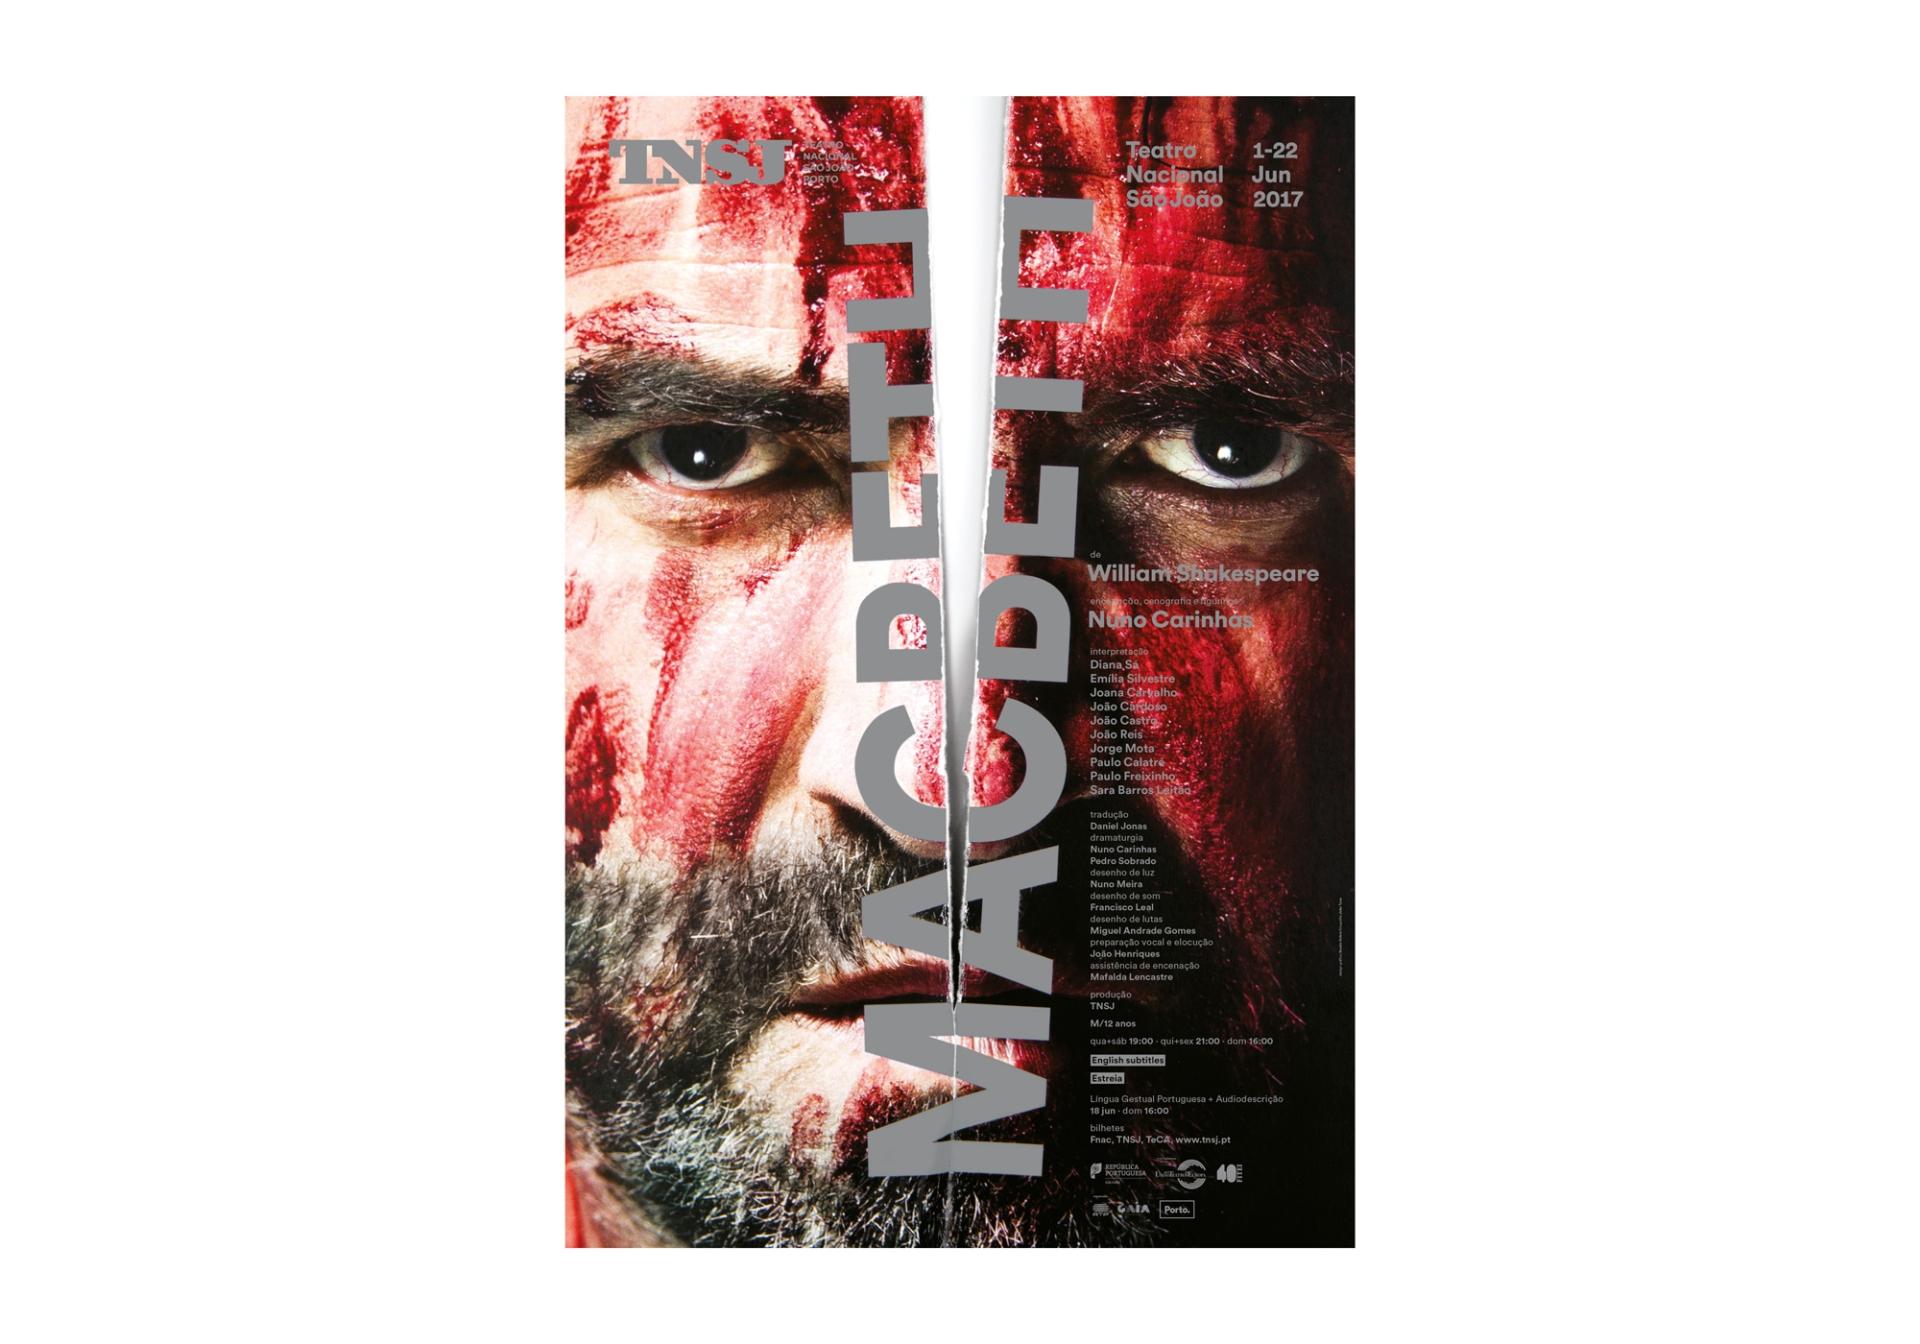 São João National Theatre Posters 2017-2018 Image:8 dobra-tnsj-Macbeth